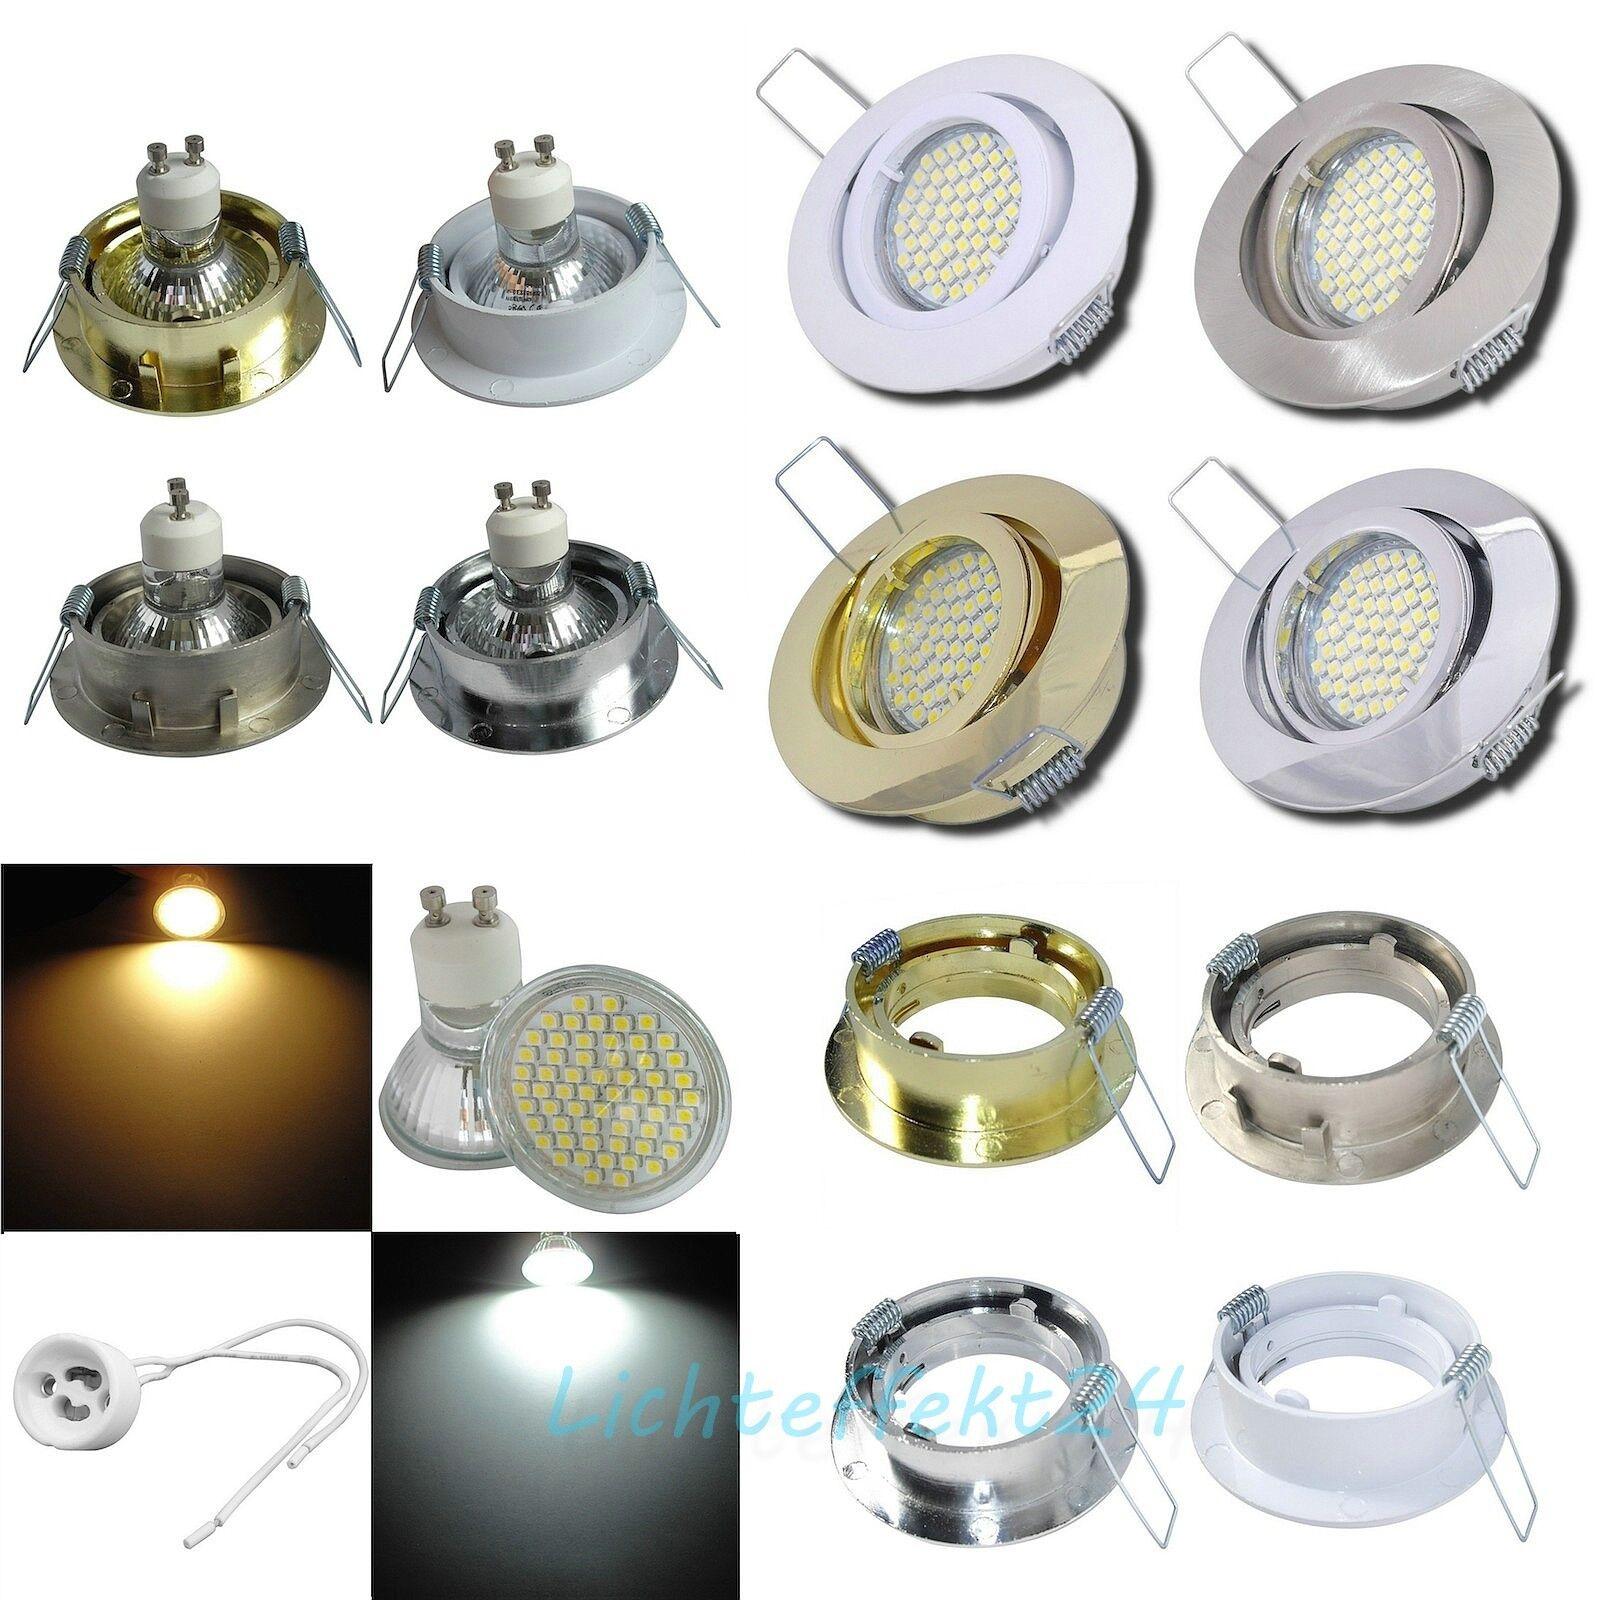 8er Set / 230V LED Einbaustrahler / Einbauleuchten / Einbauspots / Glas SMD / 3W